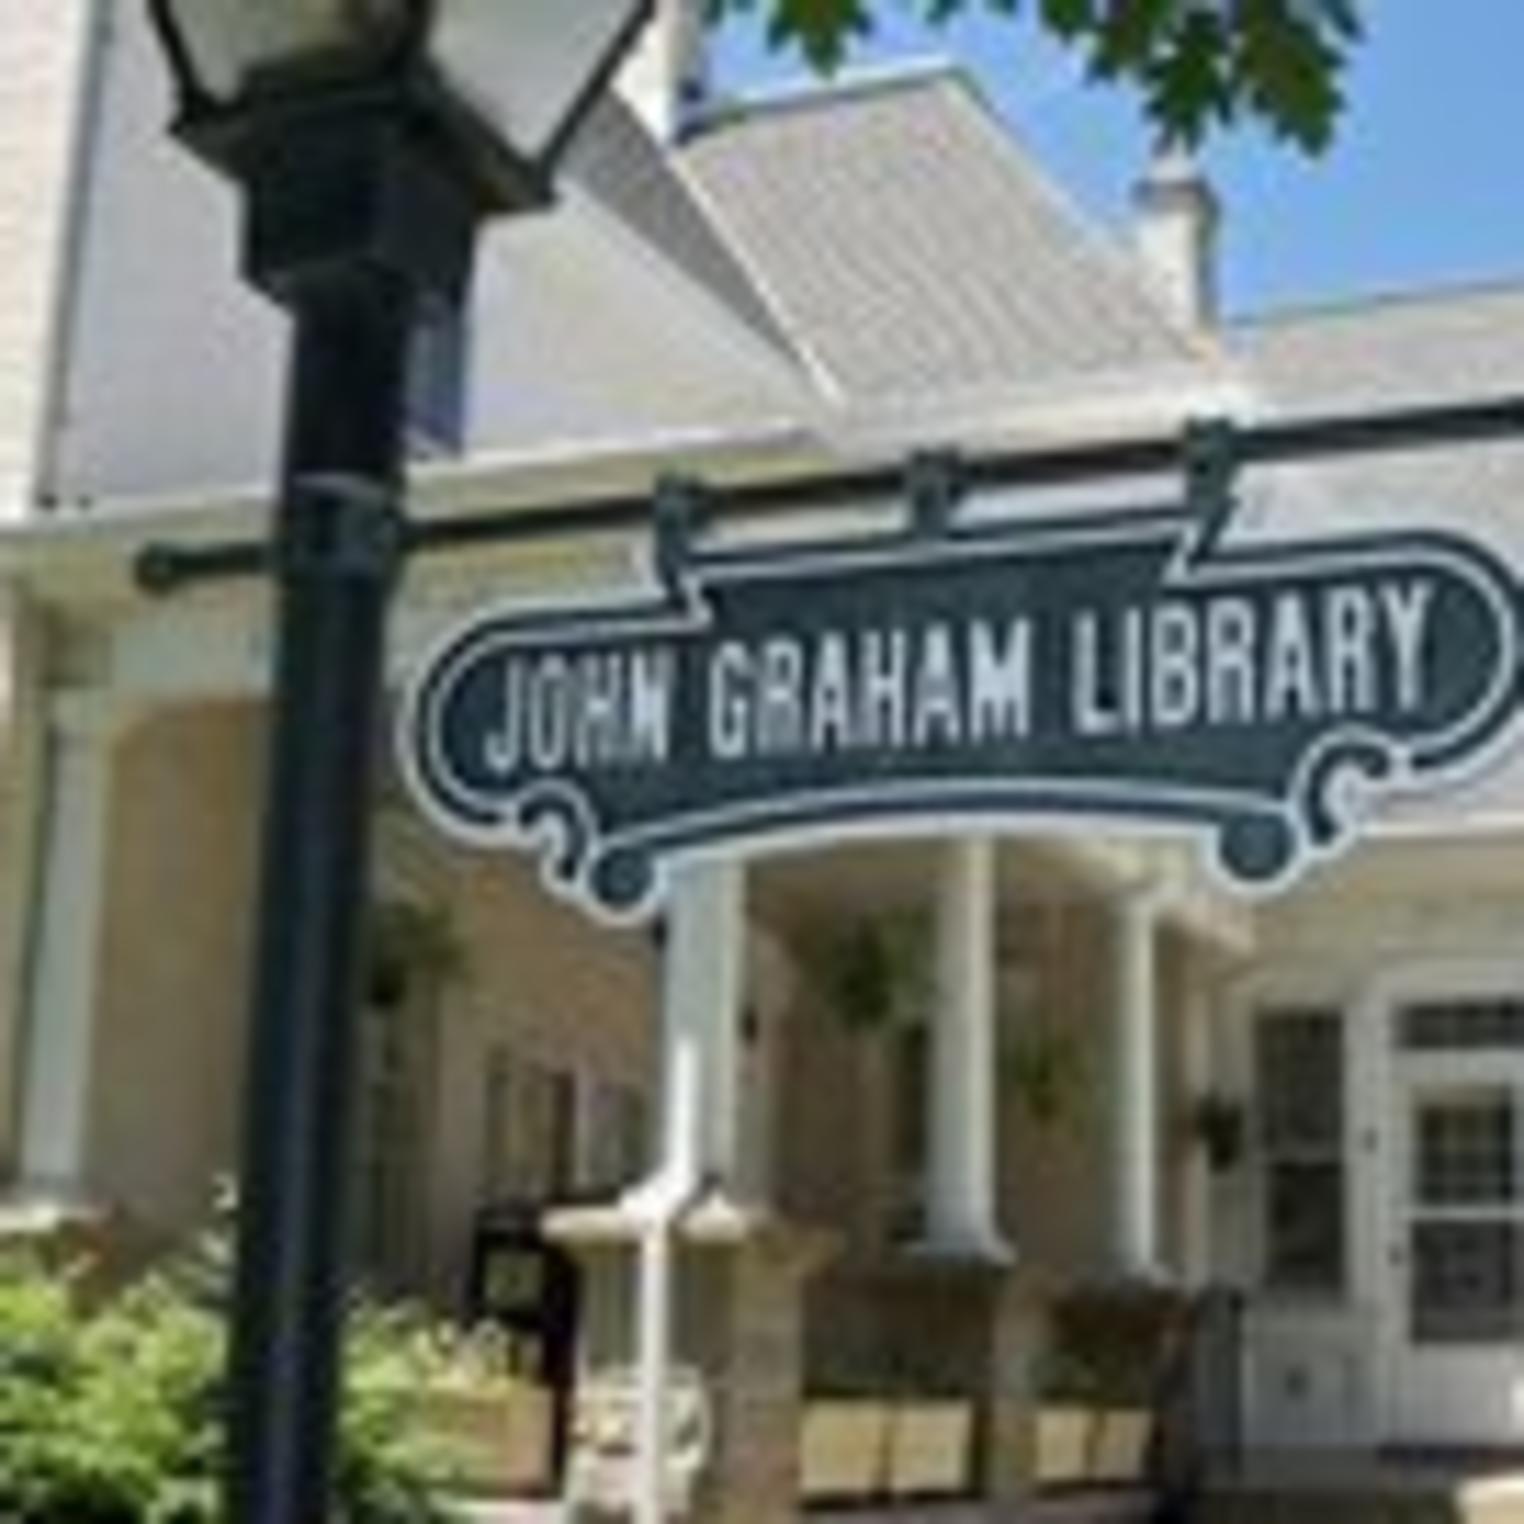 John Graham Public Library